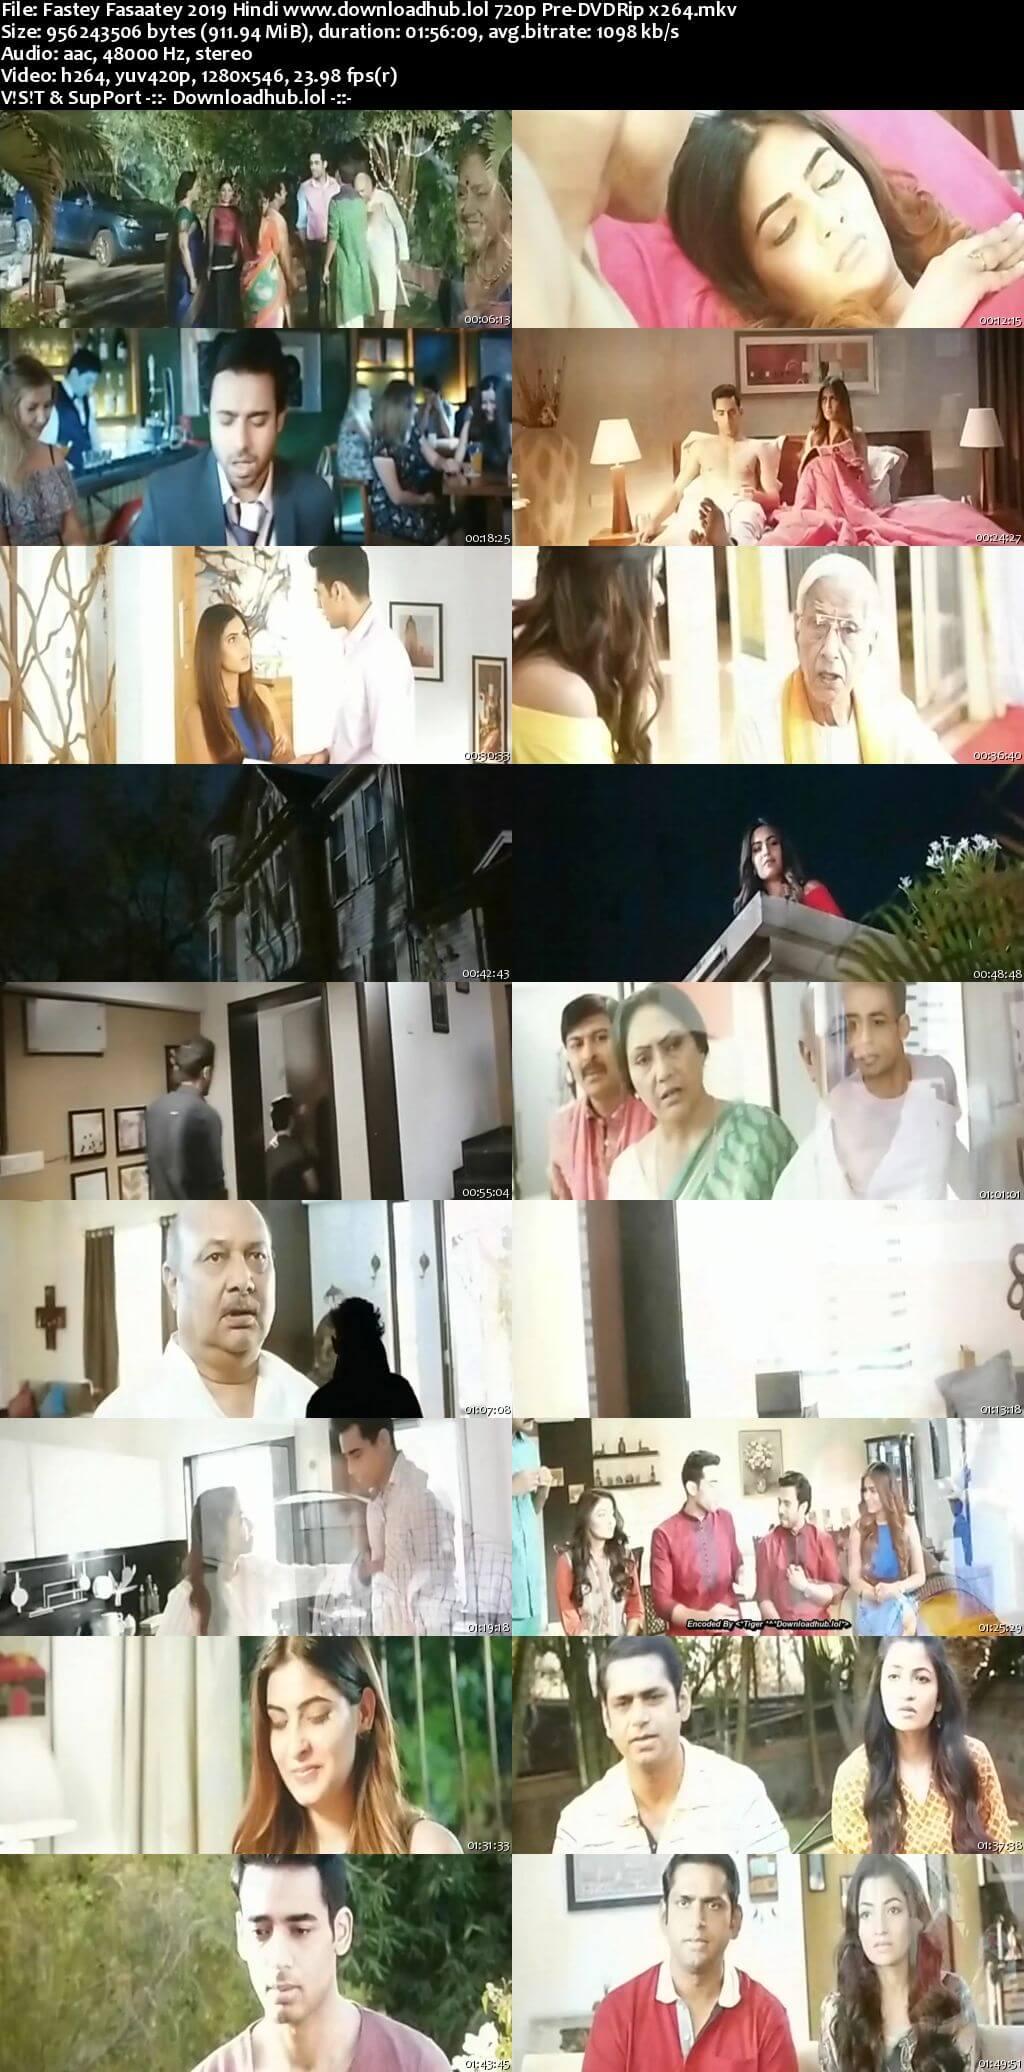 Fastey Fasaatey 2019 Hindi 720p Pre-DVDRip x264